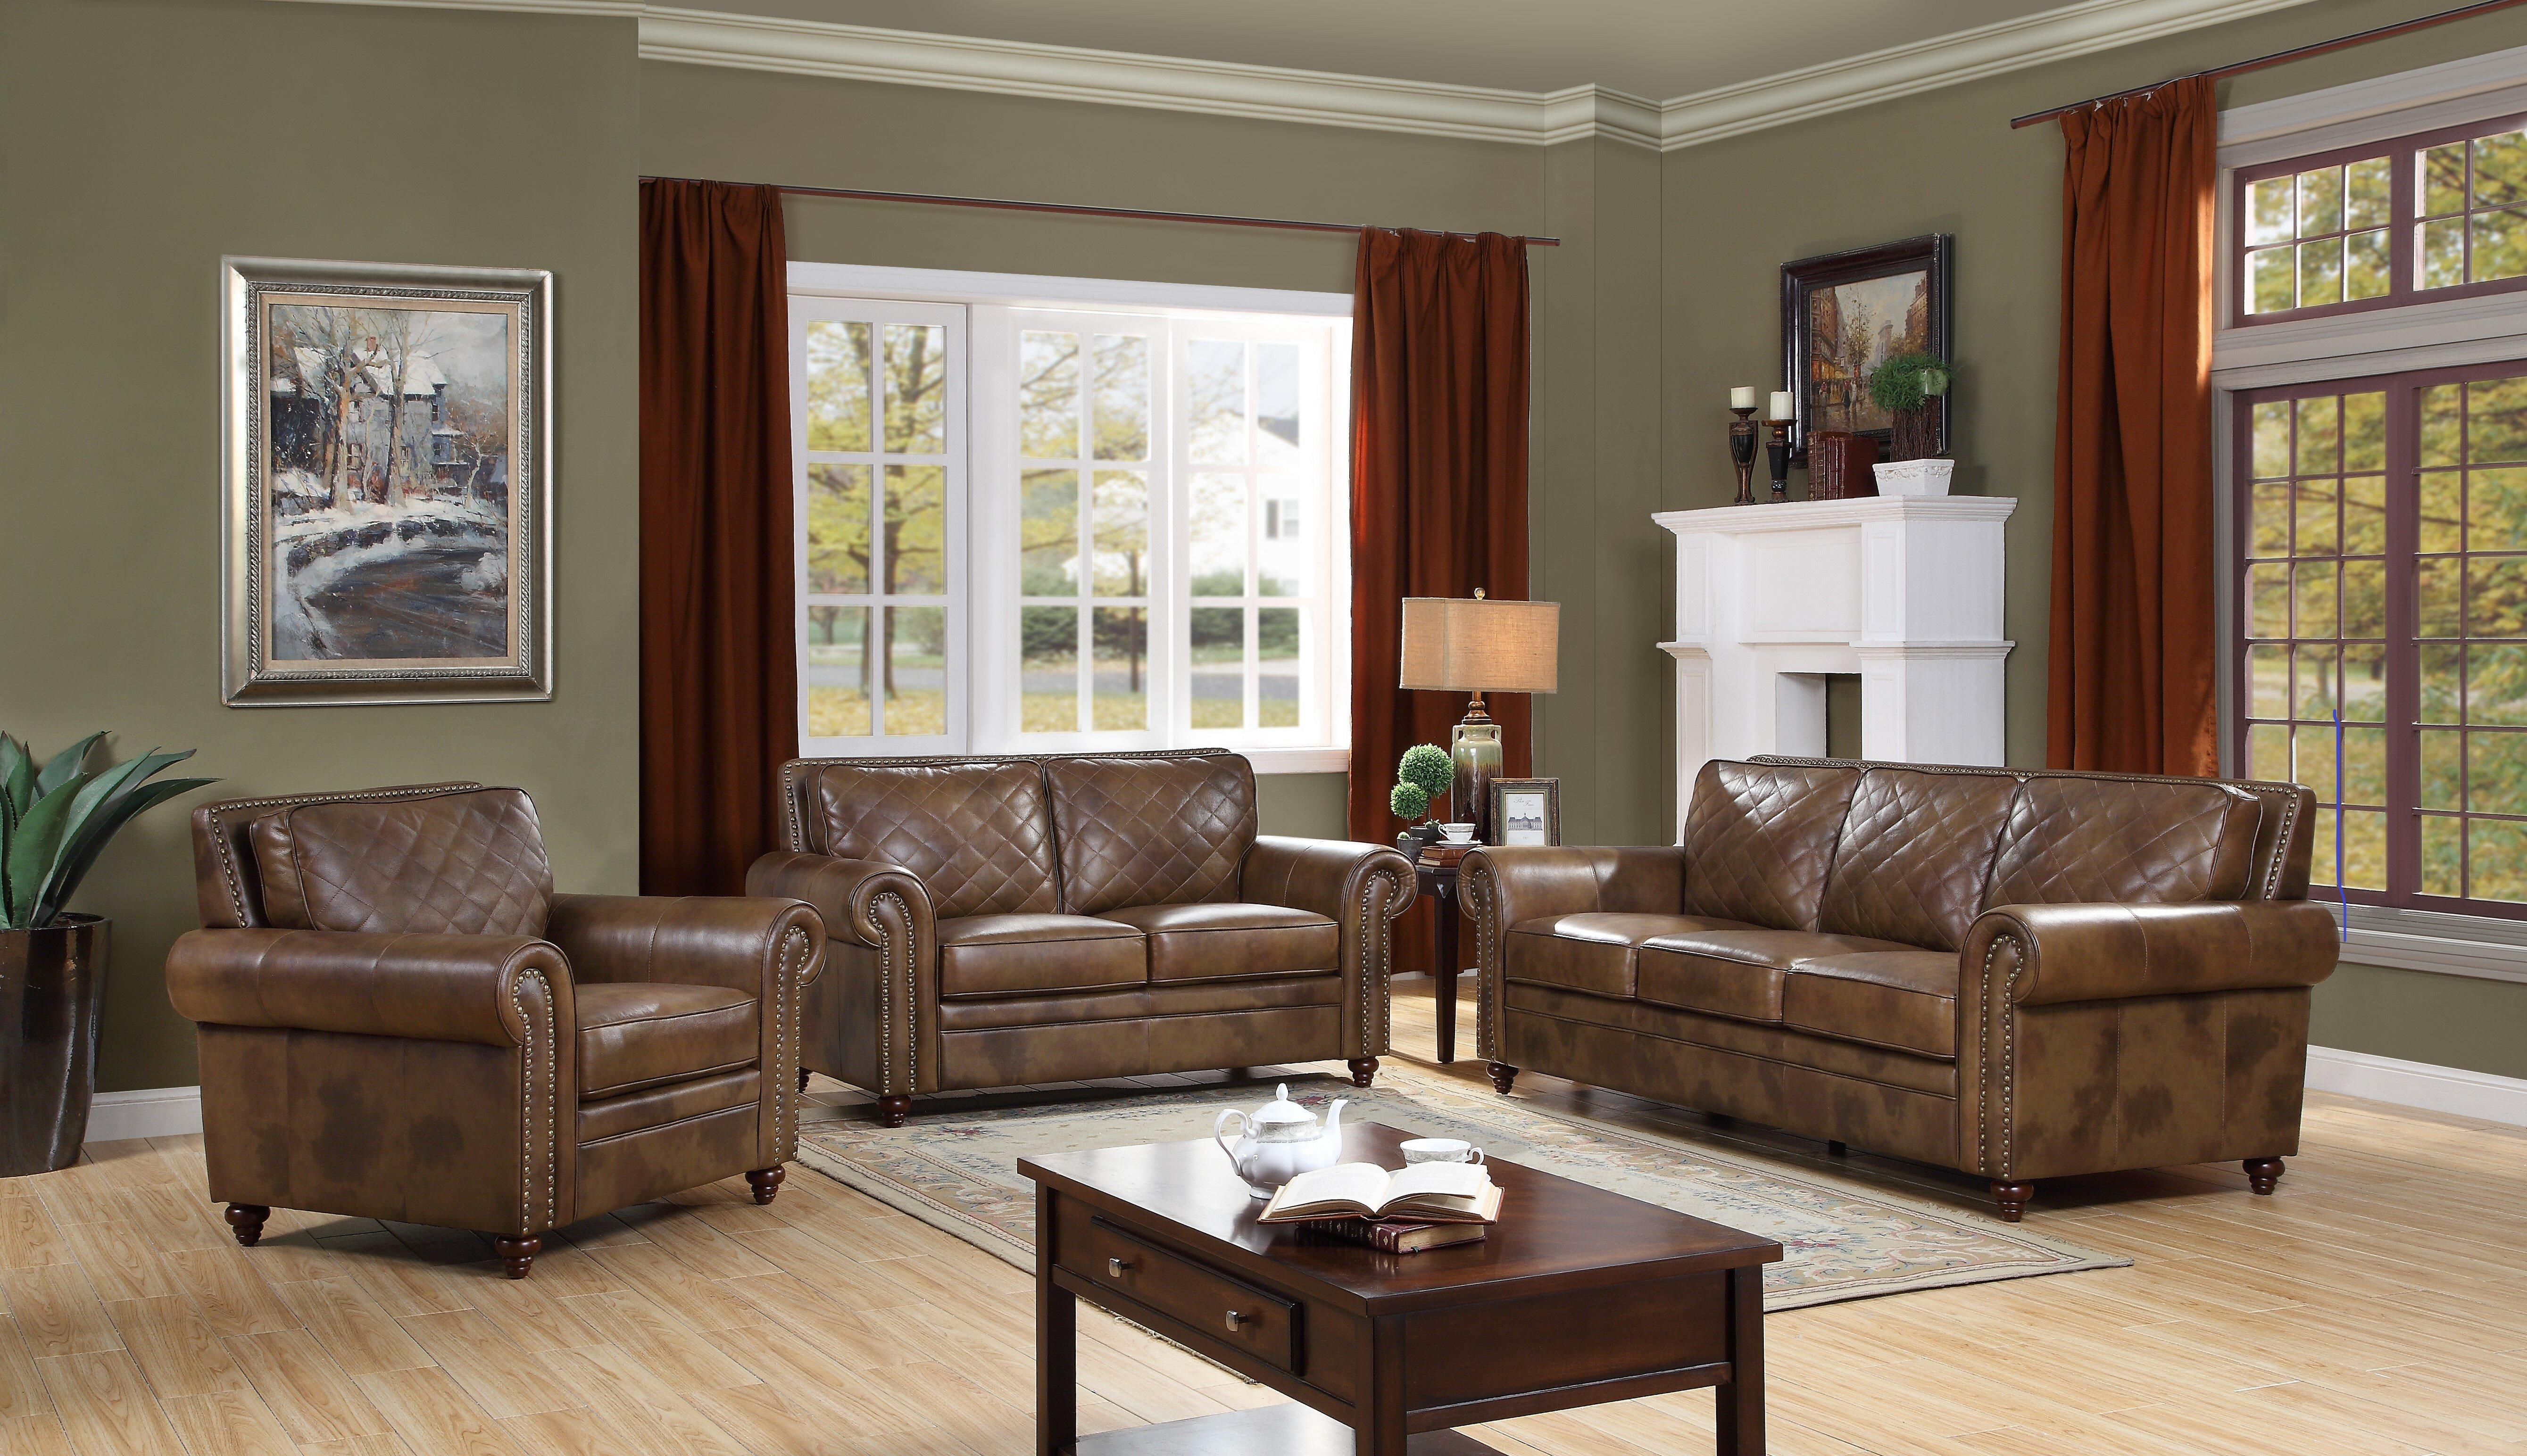 Darby Home Co Drexler 3 Piece Leather Living Room Set Wayfair